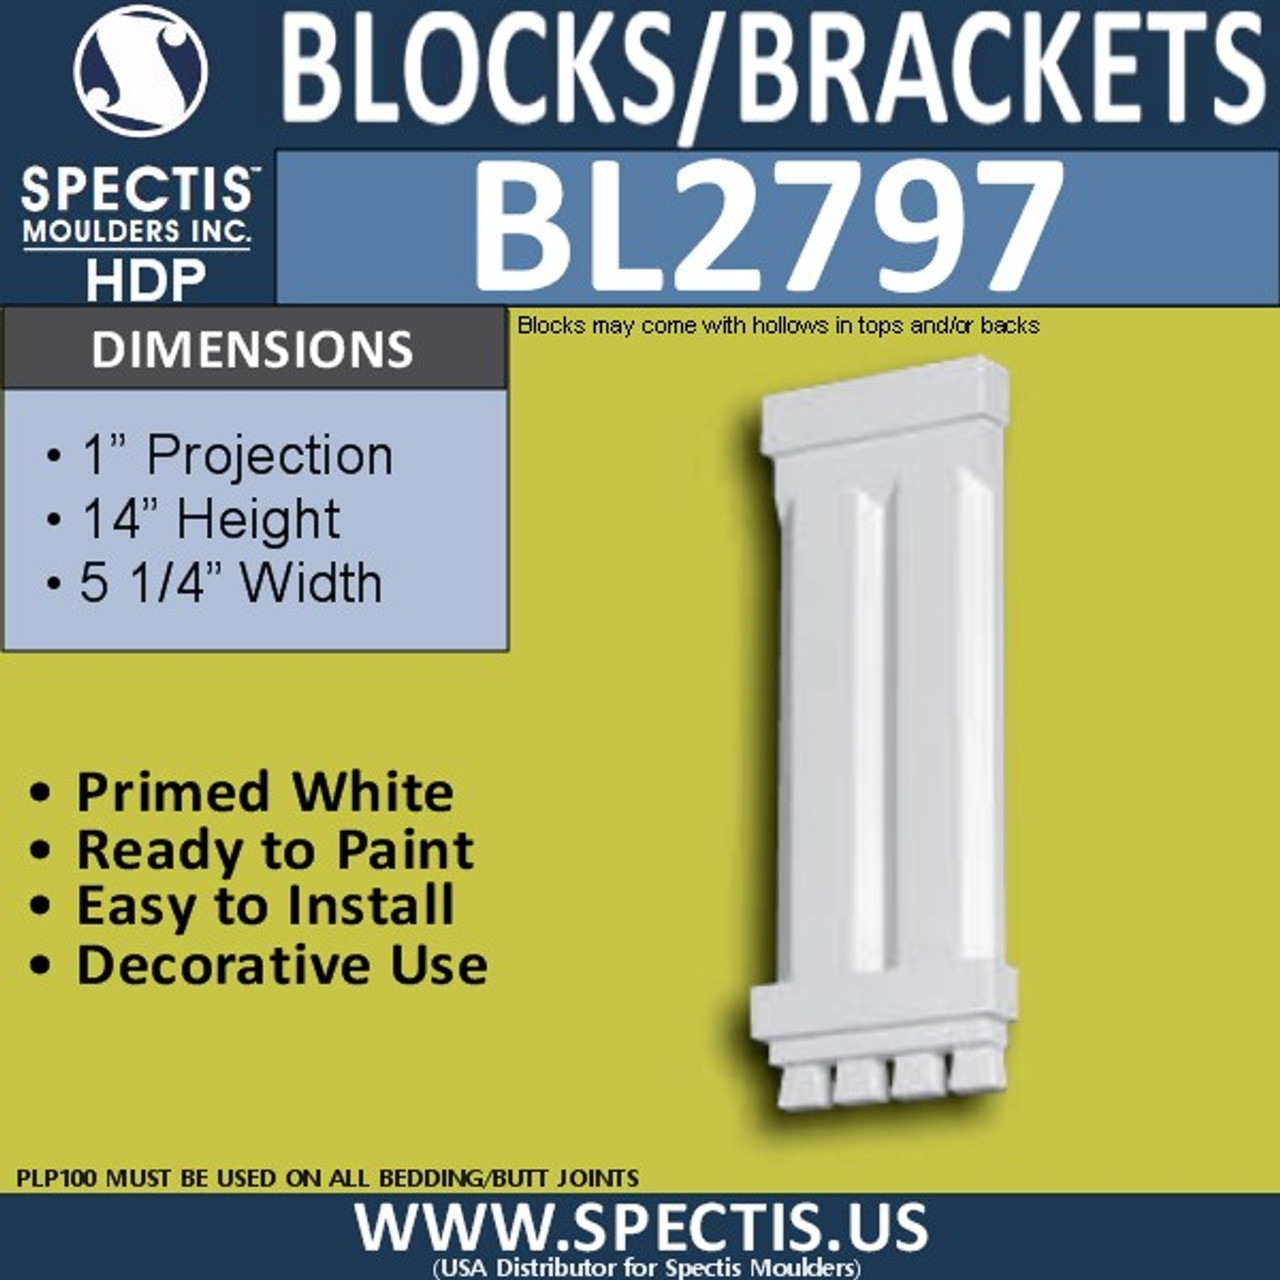 "BL2797 Eave Block or Bracket 5.25""W x 14""H x 1"" P"